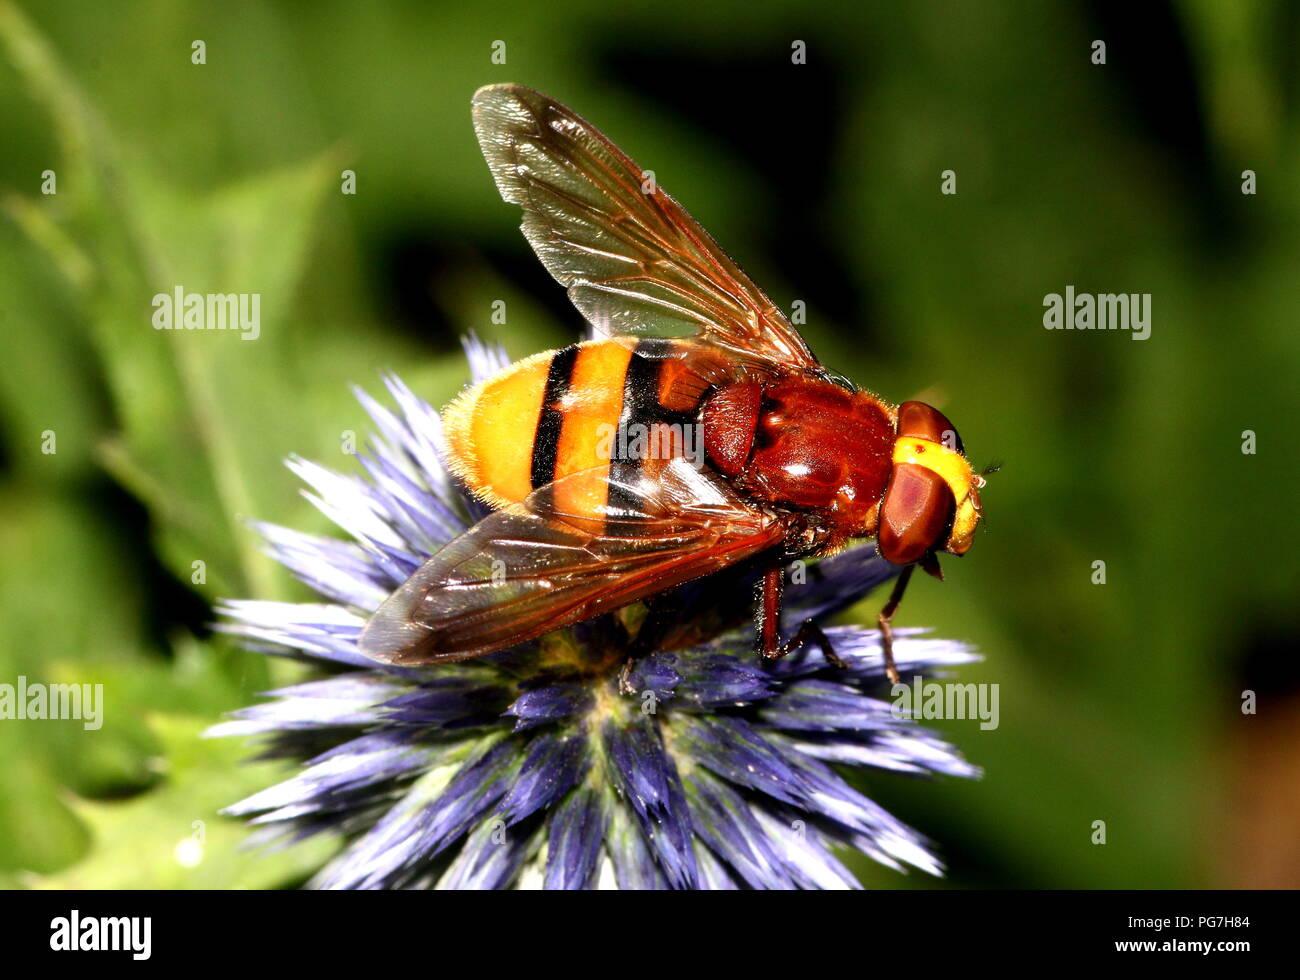 European Hornet mimic hoverfly (Volucella zonaria). Stock Photo